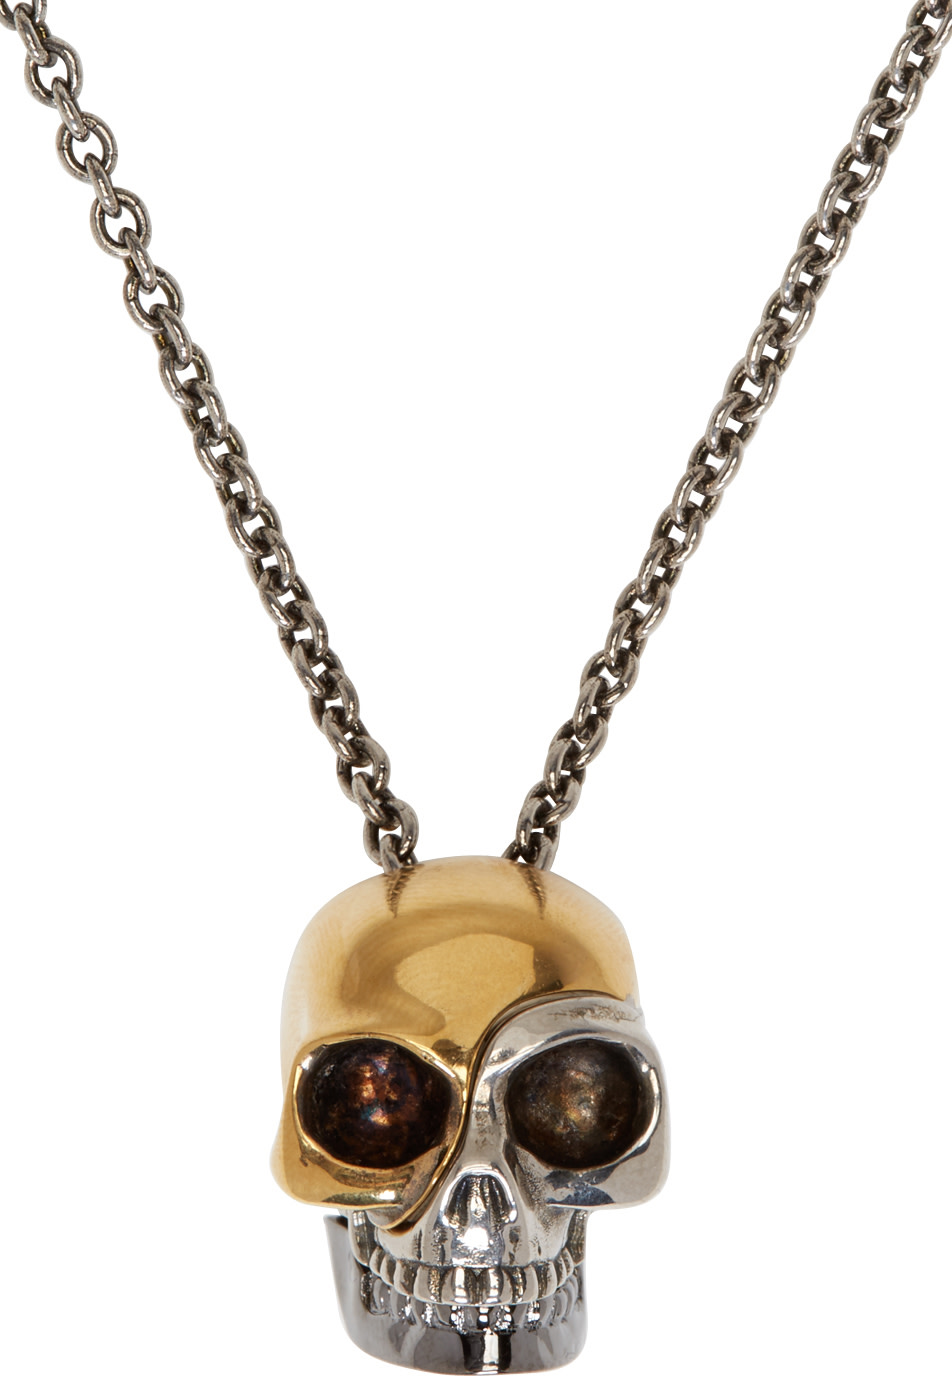 2ec4d73549b592 Very Goods Alexander Mcqueen Silver Gold Divided Skull Necklace